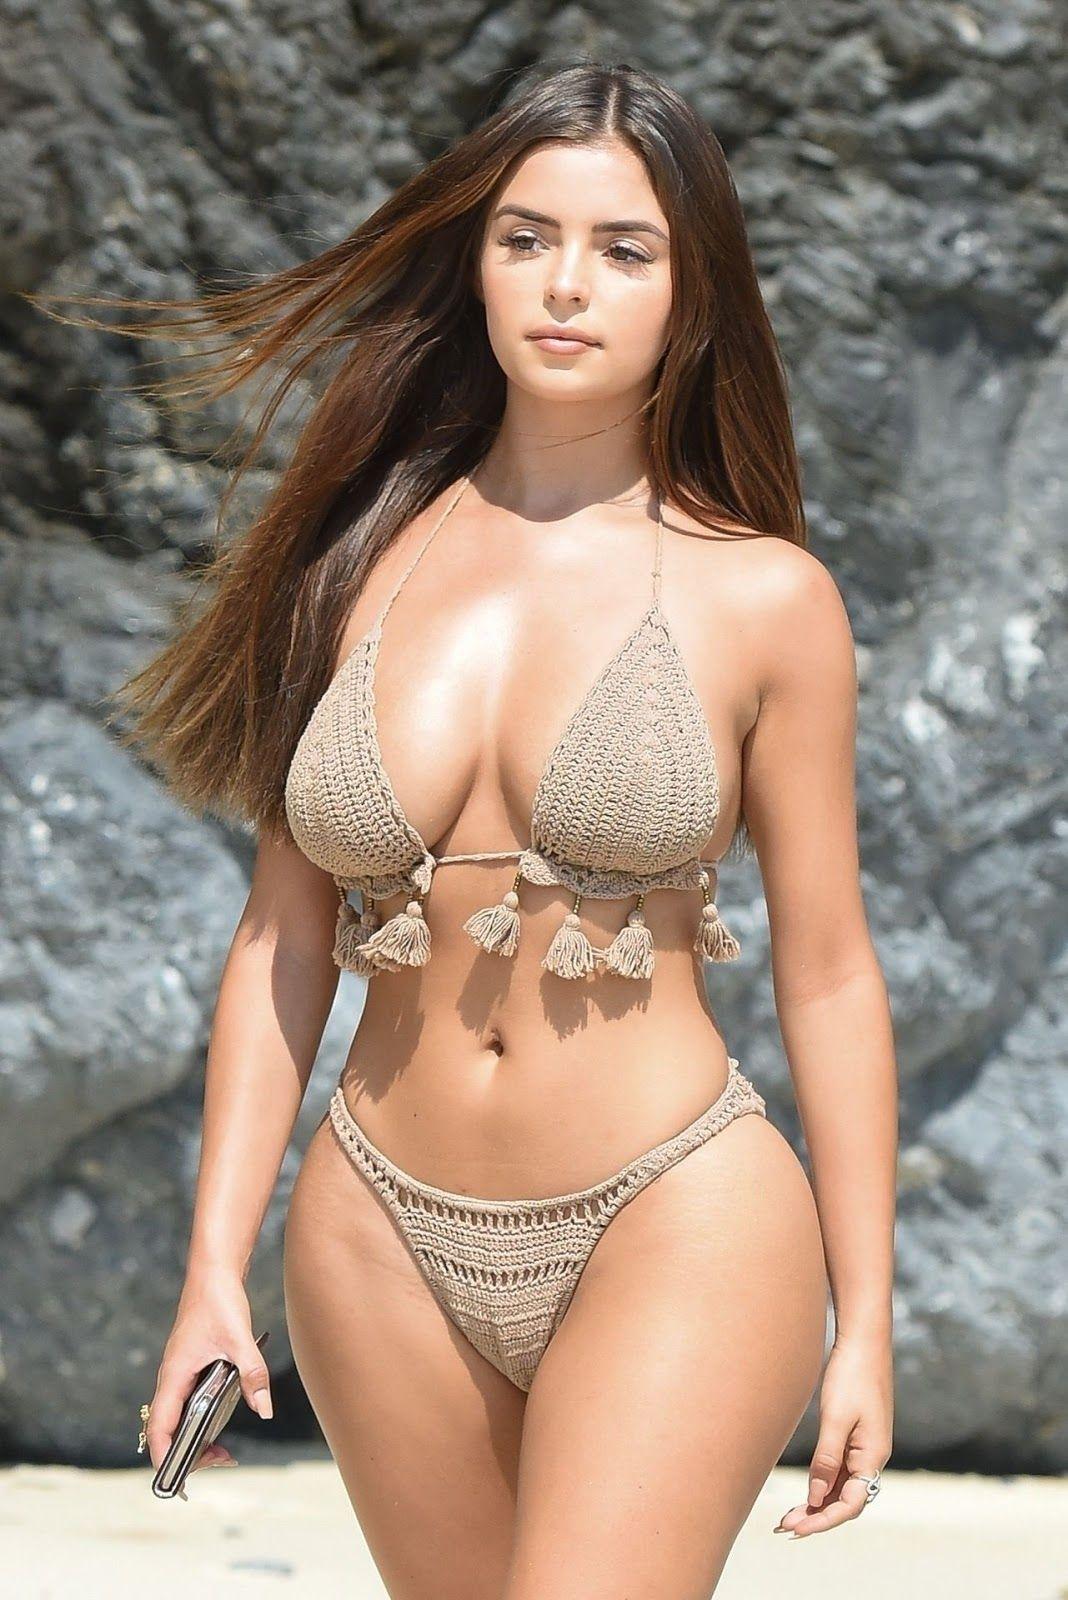 Curvy Supermodel 2021 Kandidatinnen